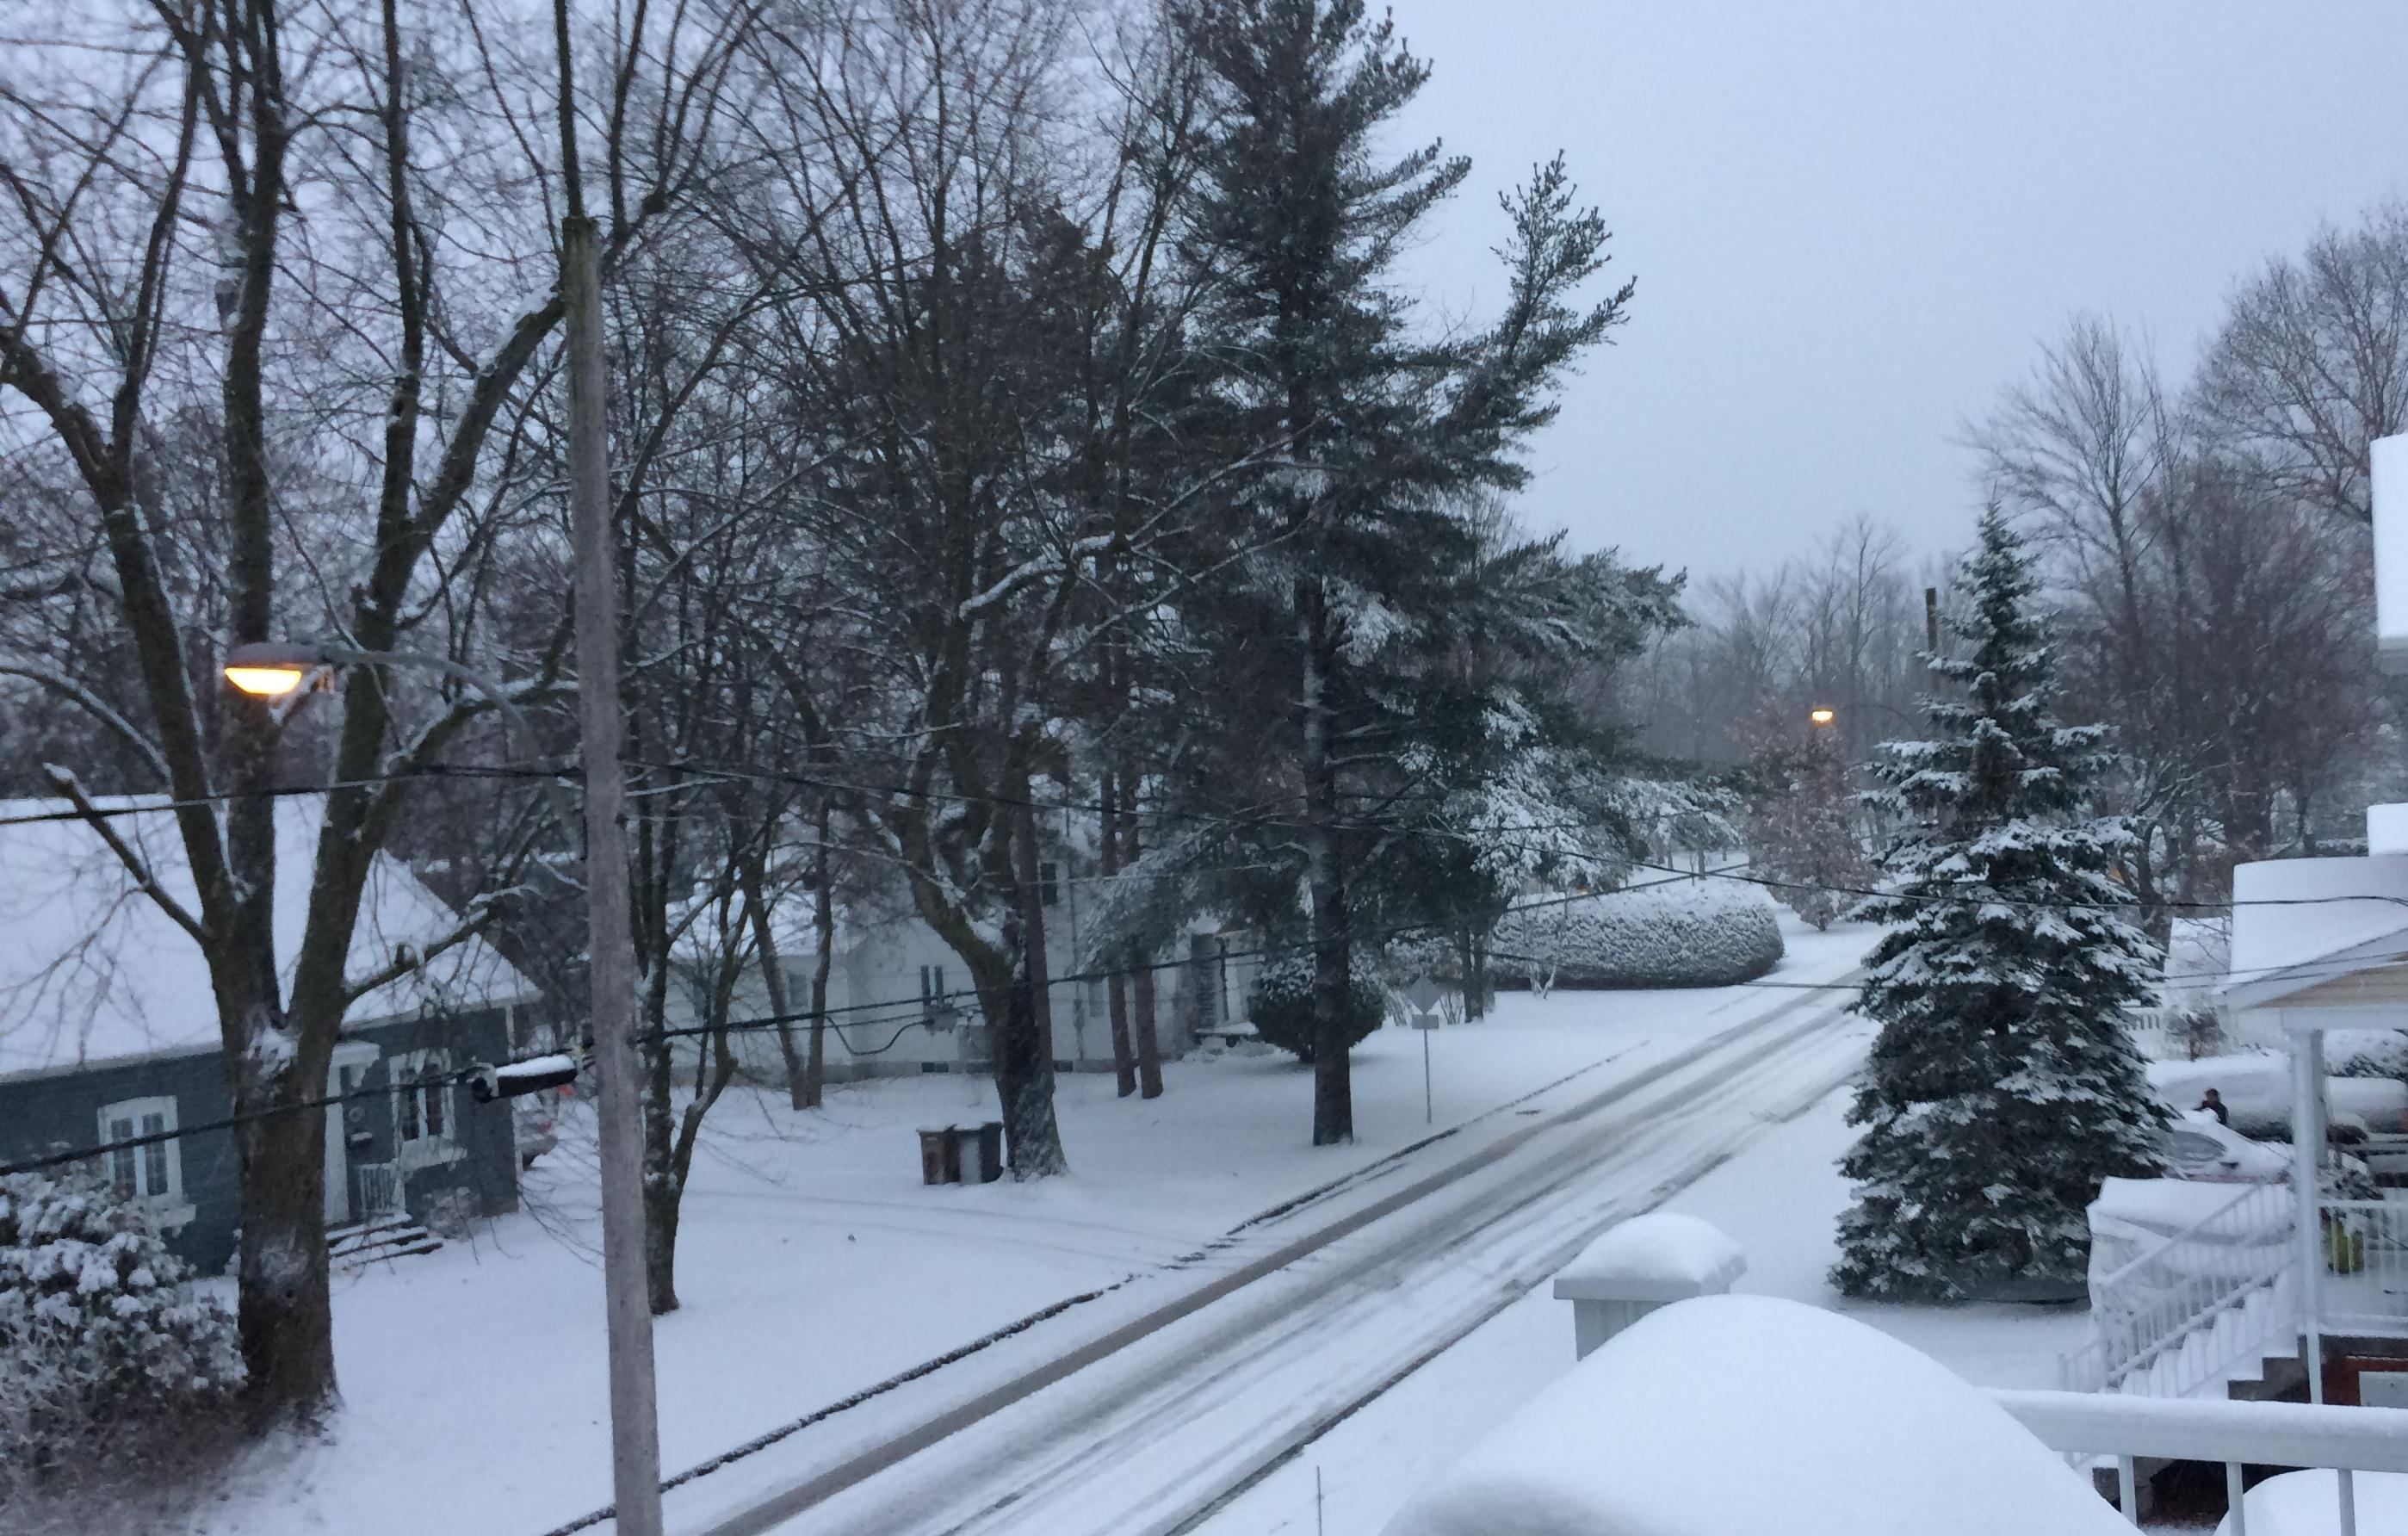 Météo : un hiver doux ou glacial?